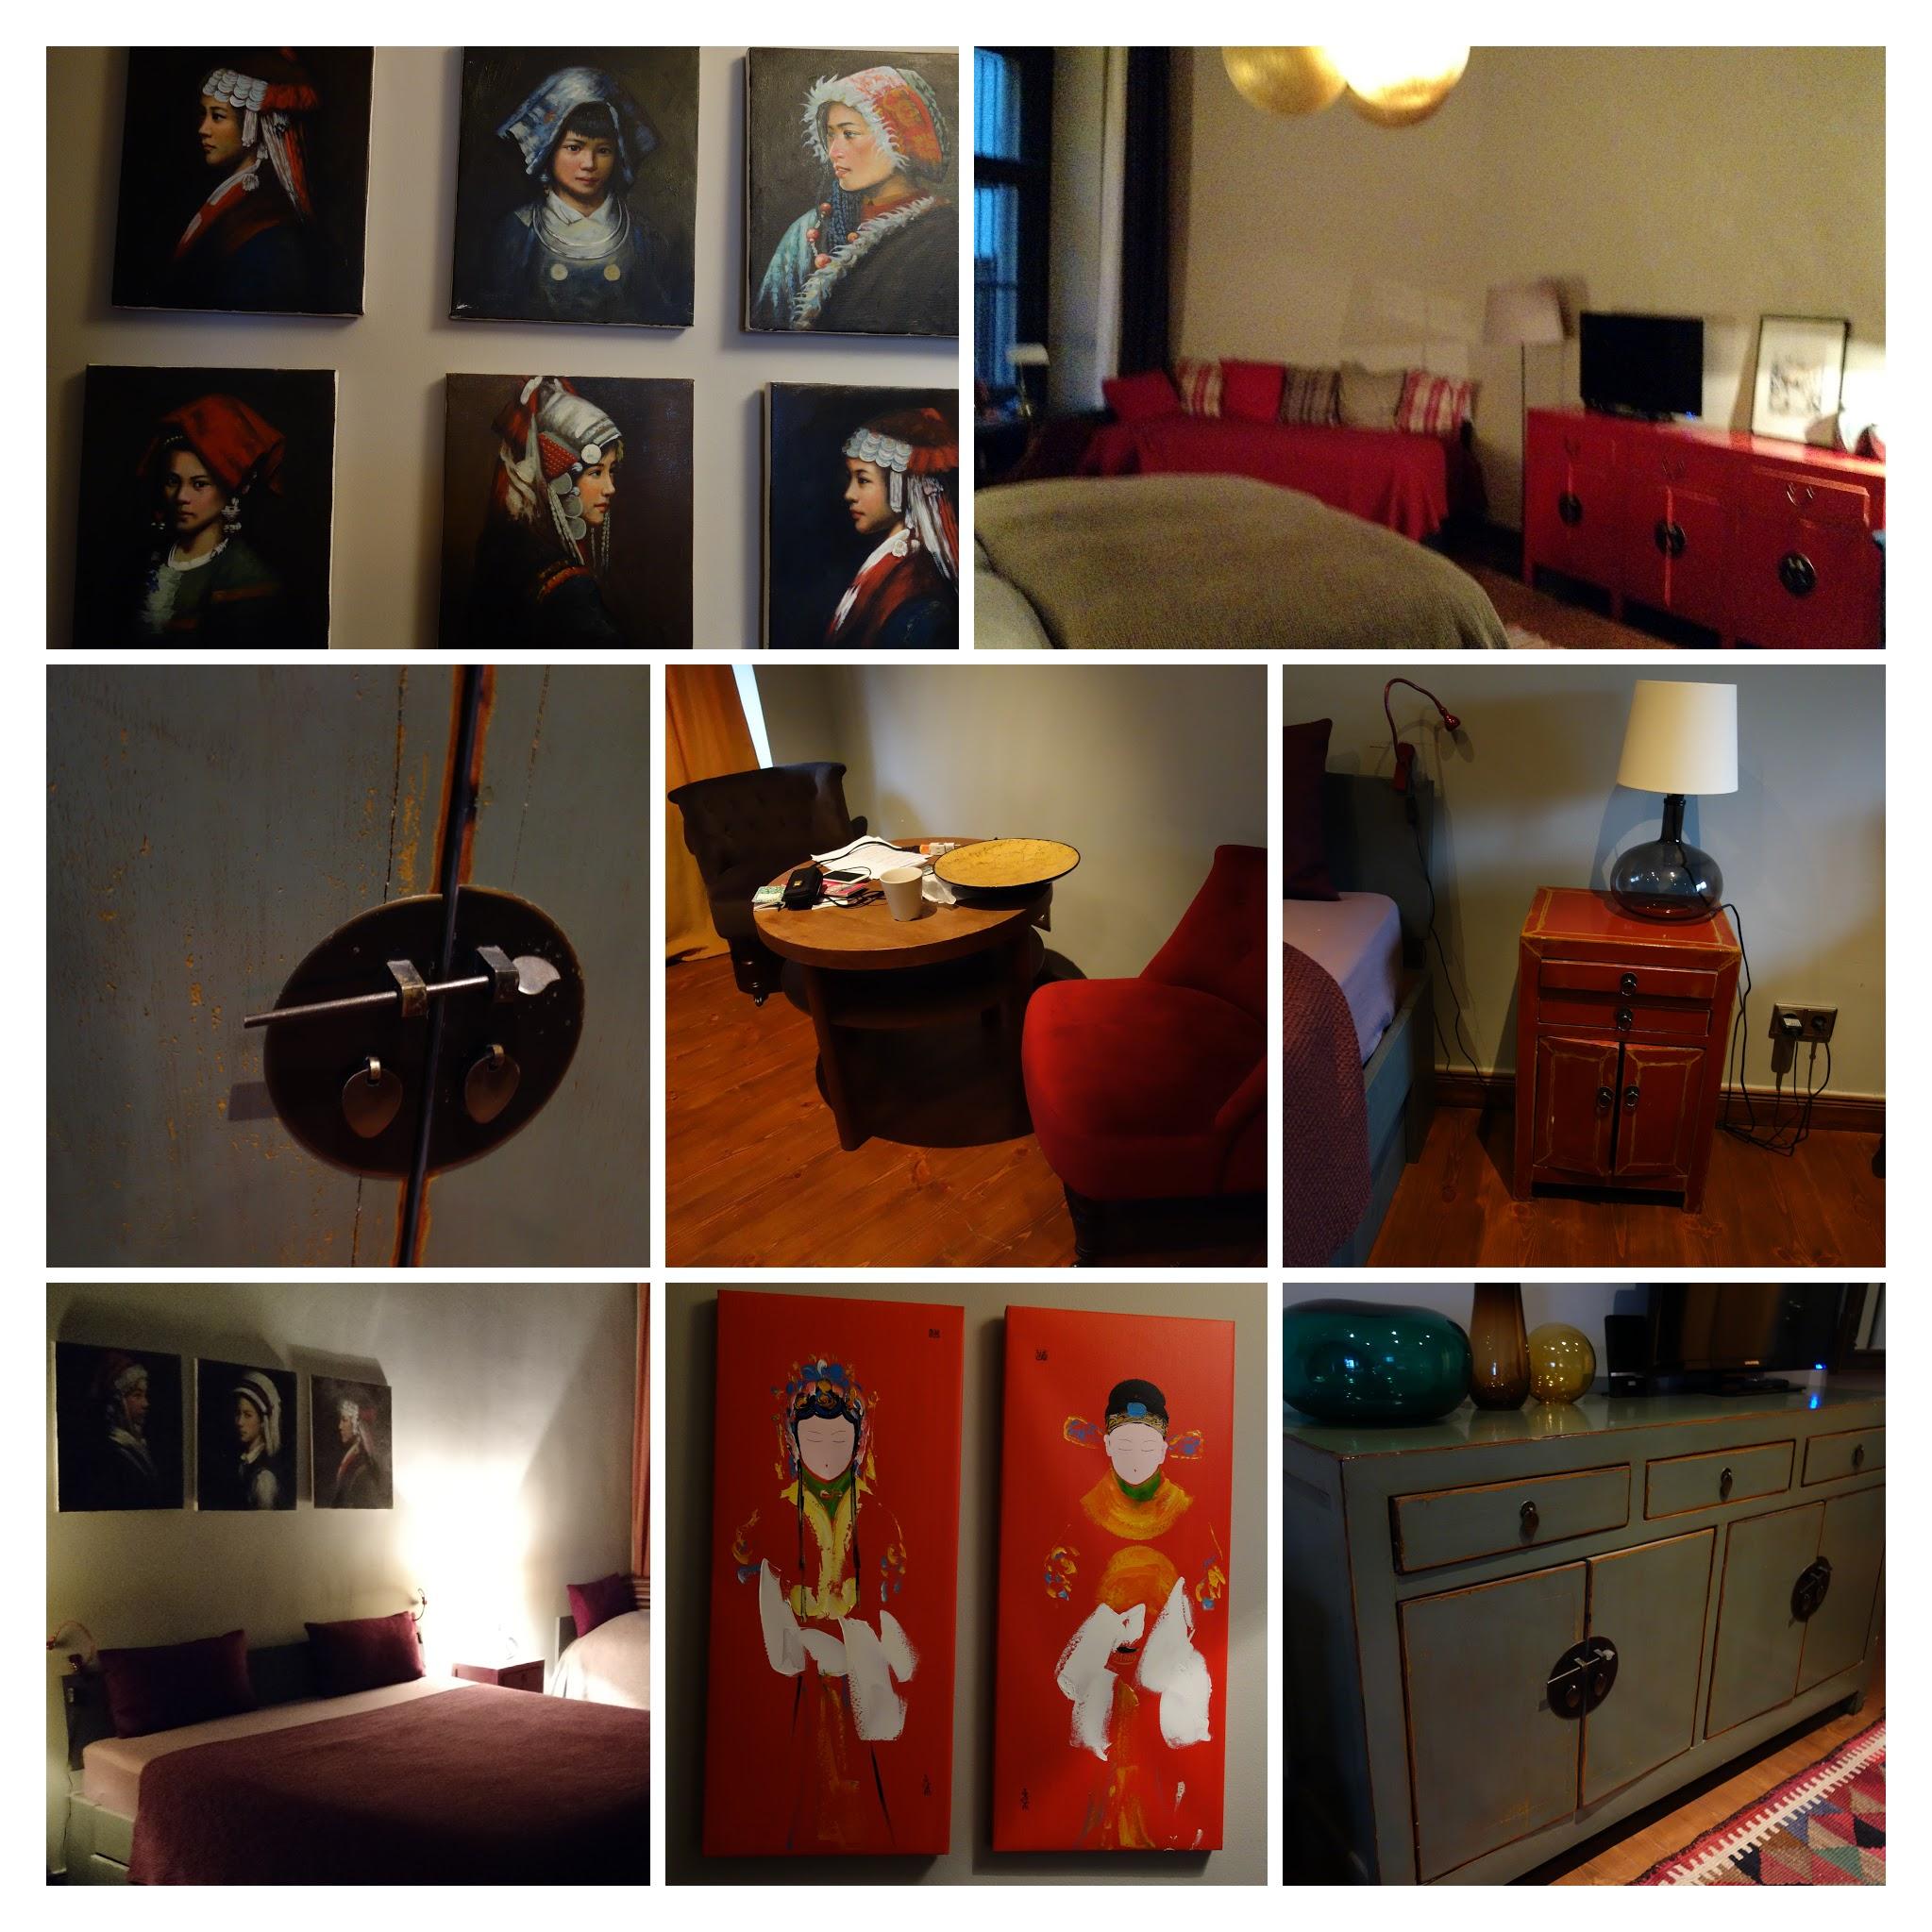 Berlin住地卧室 -COLLAGE